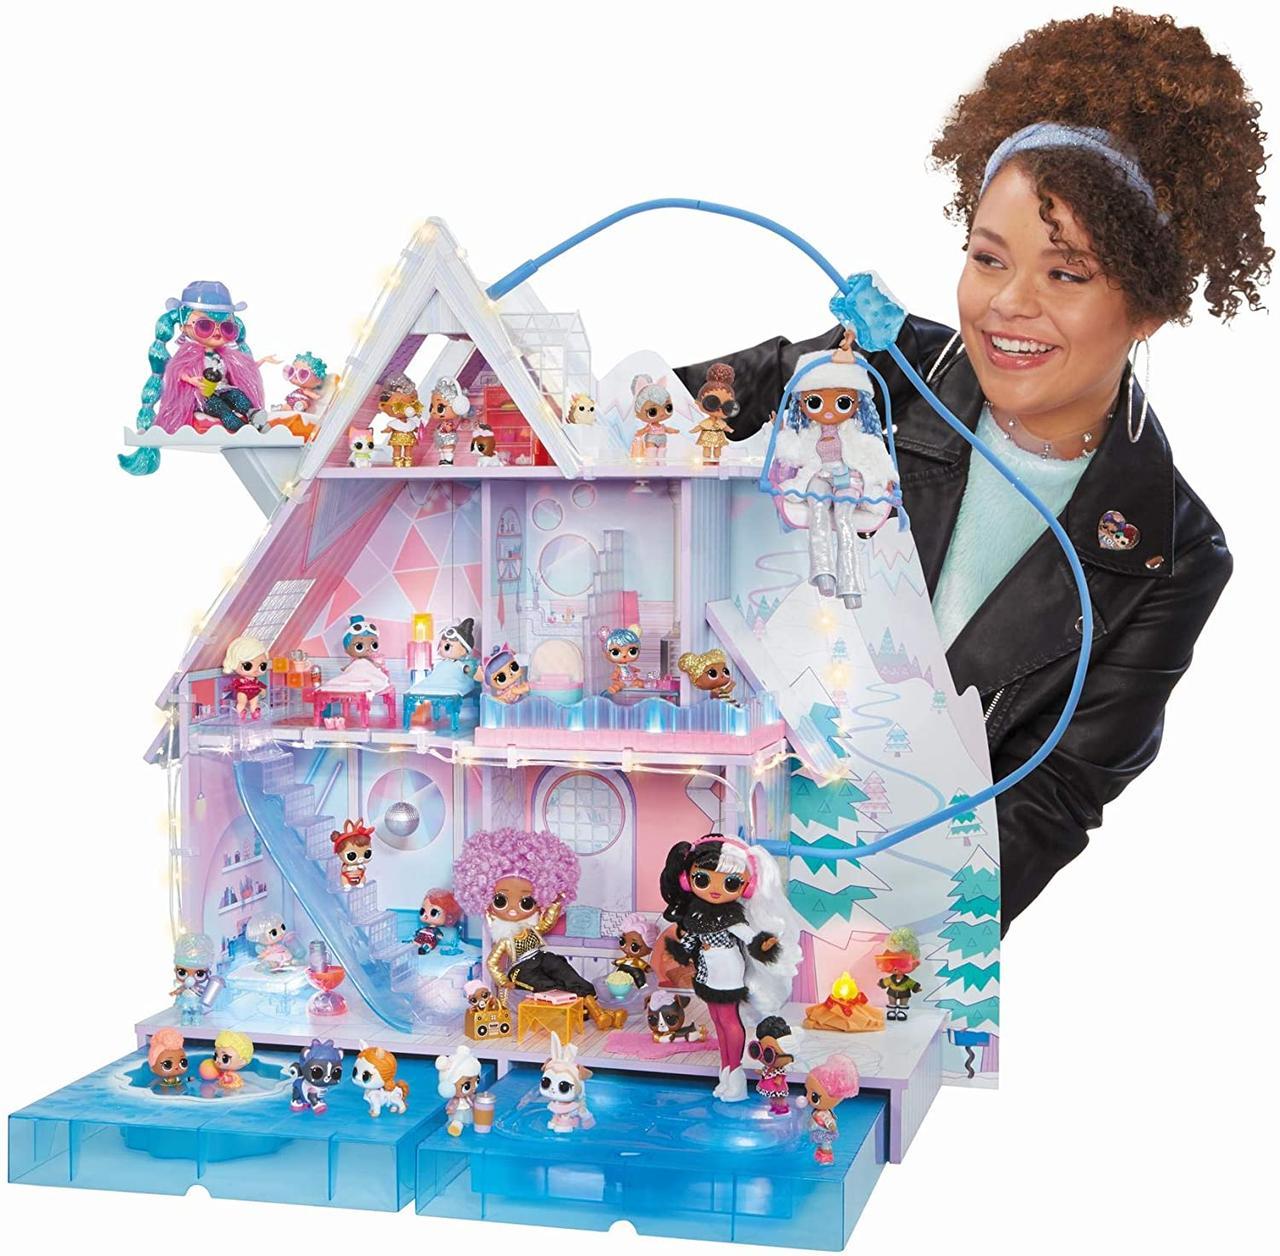 Домик для кукол ЛОЛ Сюрприз Зимний Шале  - LOL Surprise Chalet Winter Wonderland 571452